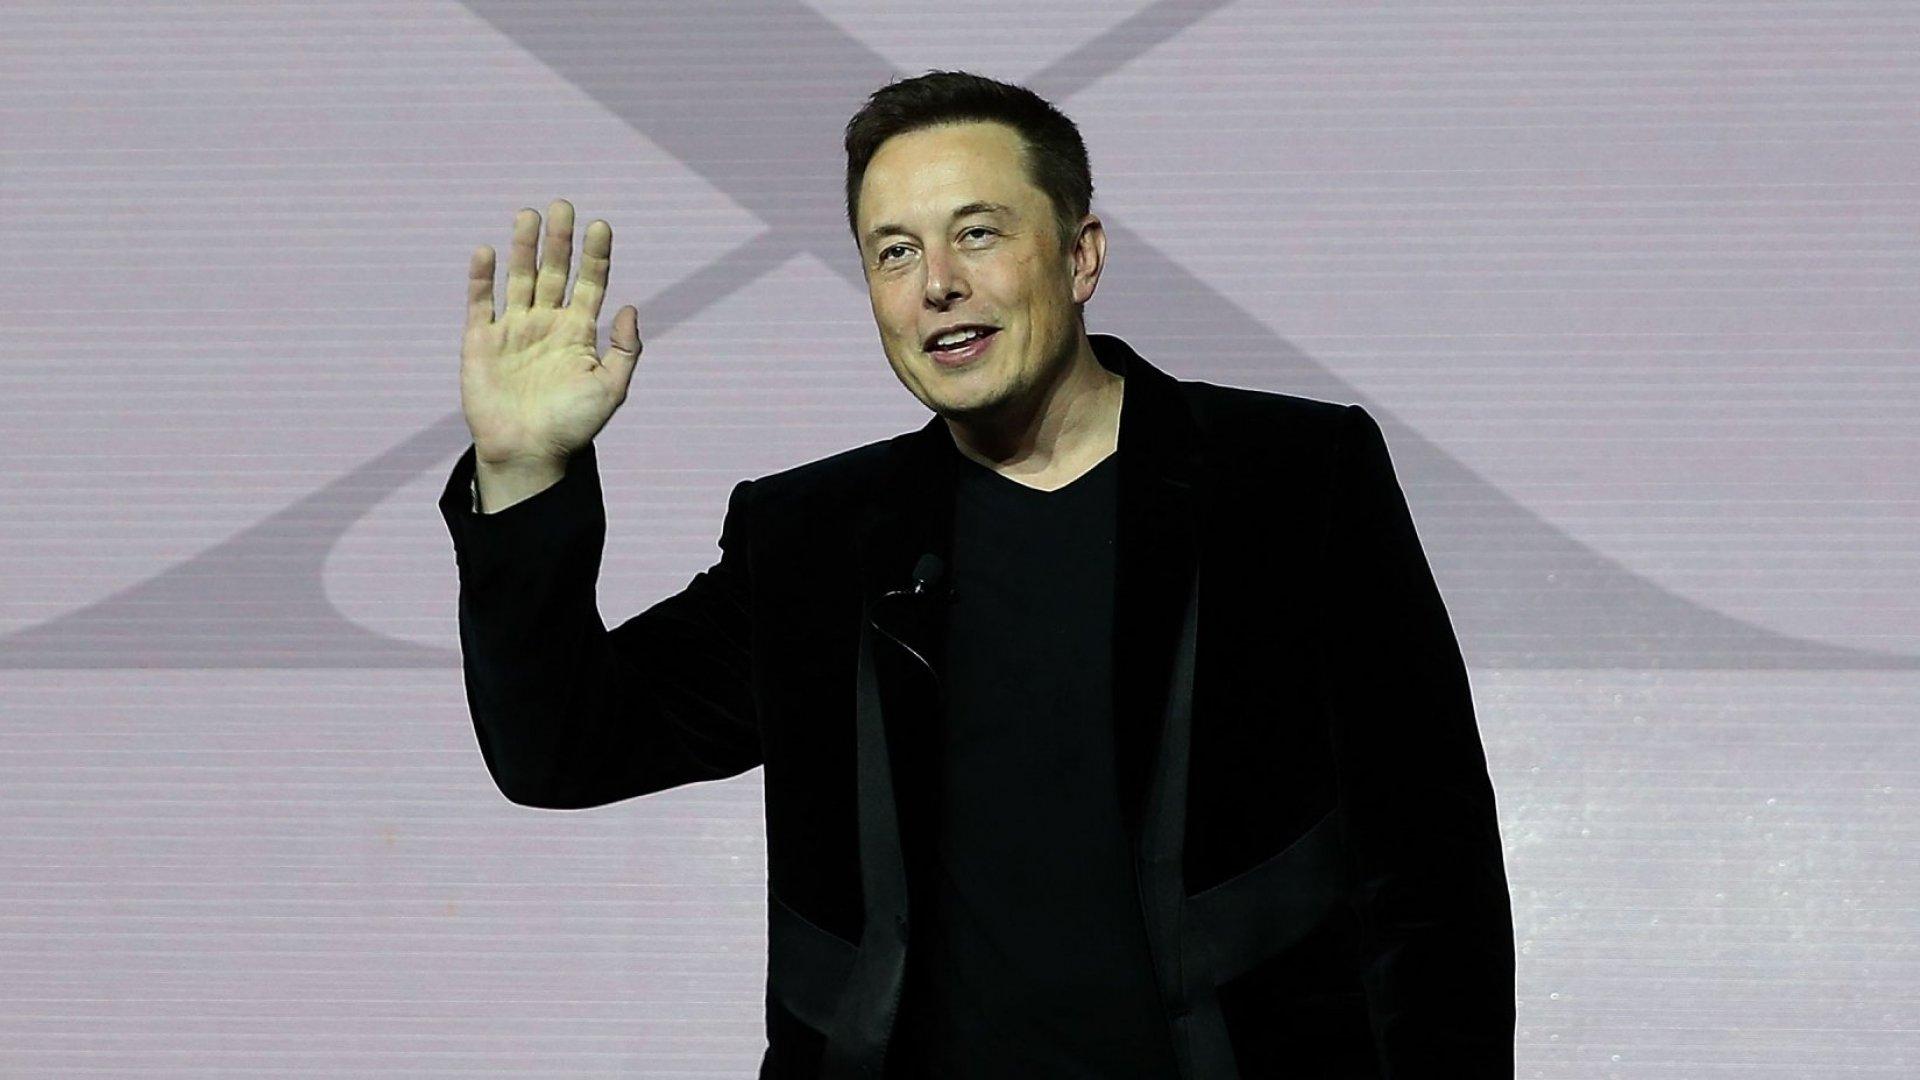 Elon Musk Announces Tesla Autopilot Update on Twitter